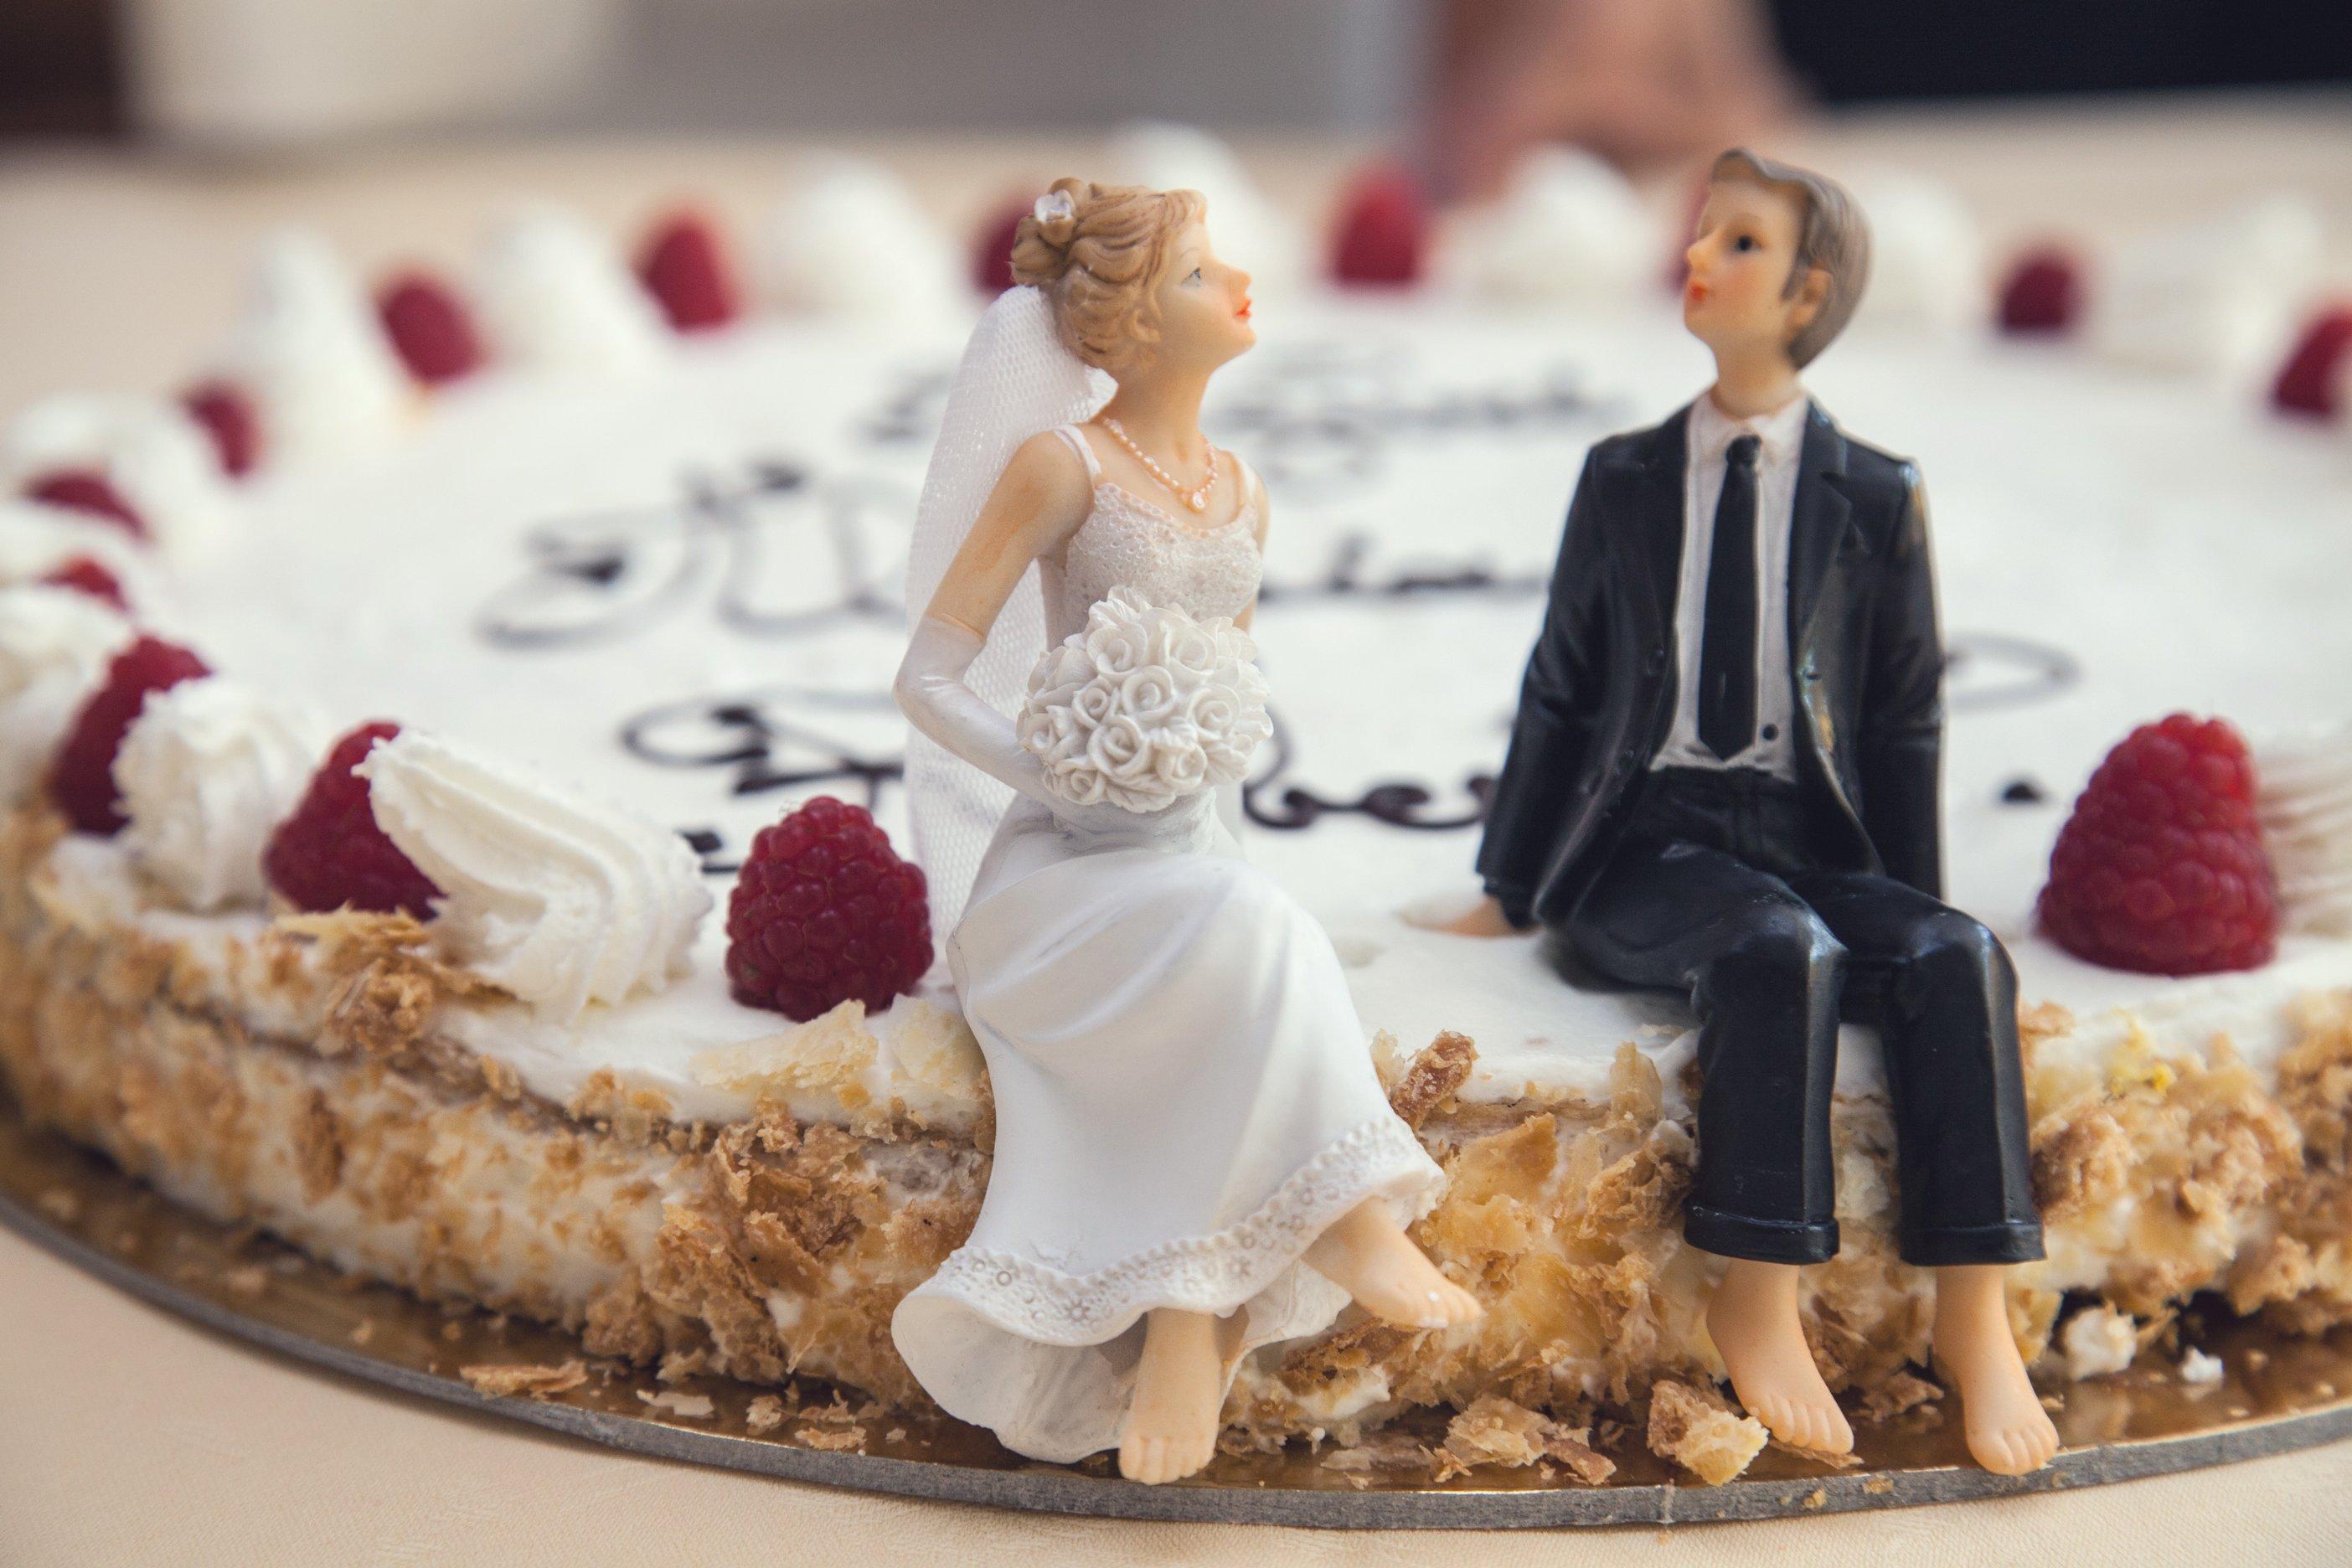 rsz_food-couple-sweet-married-2226